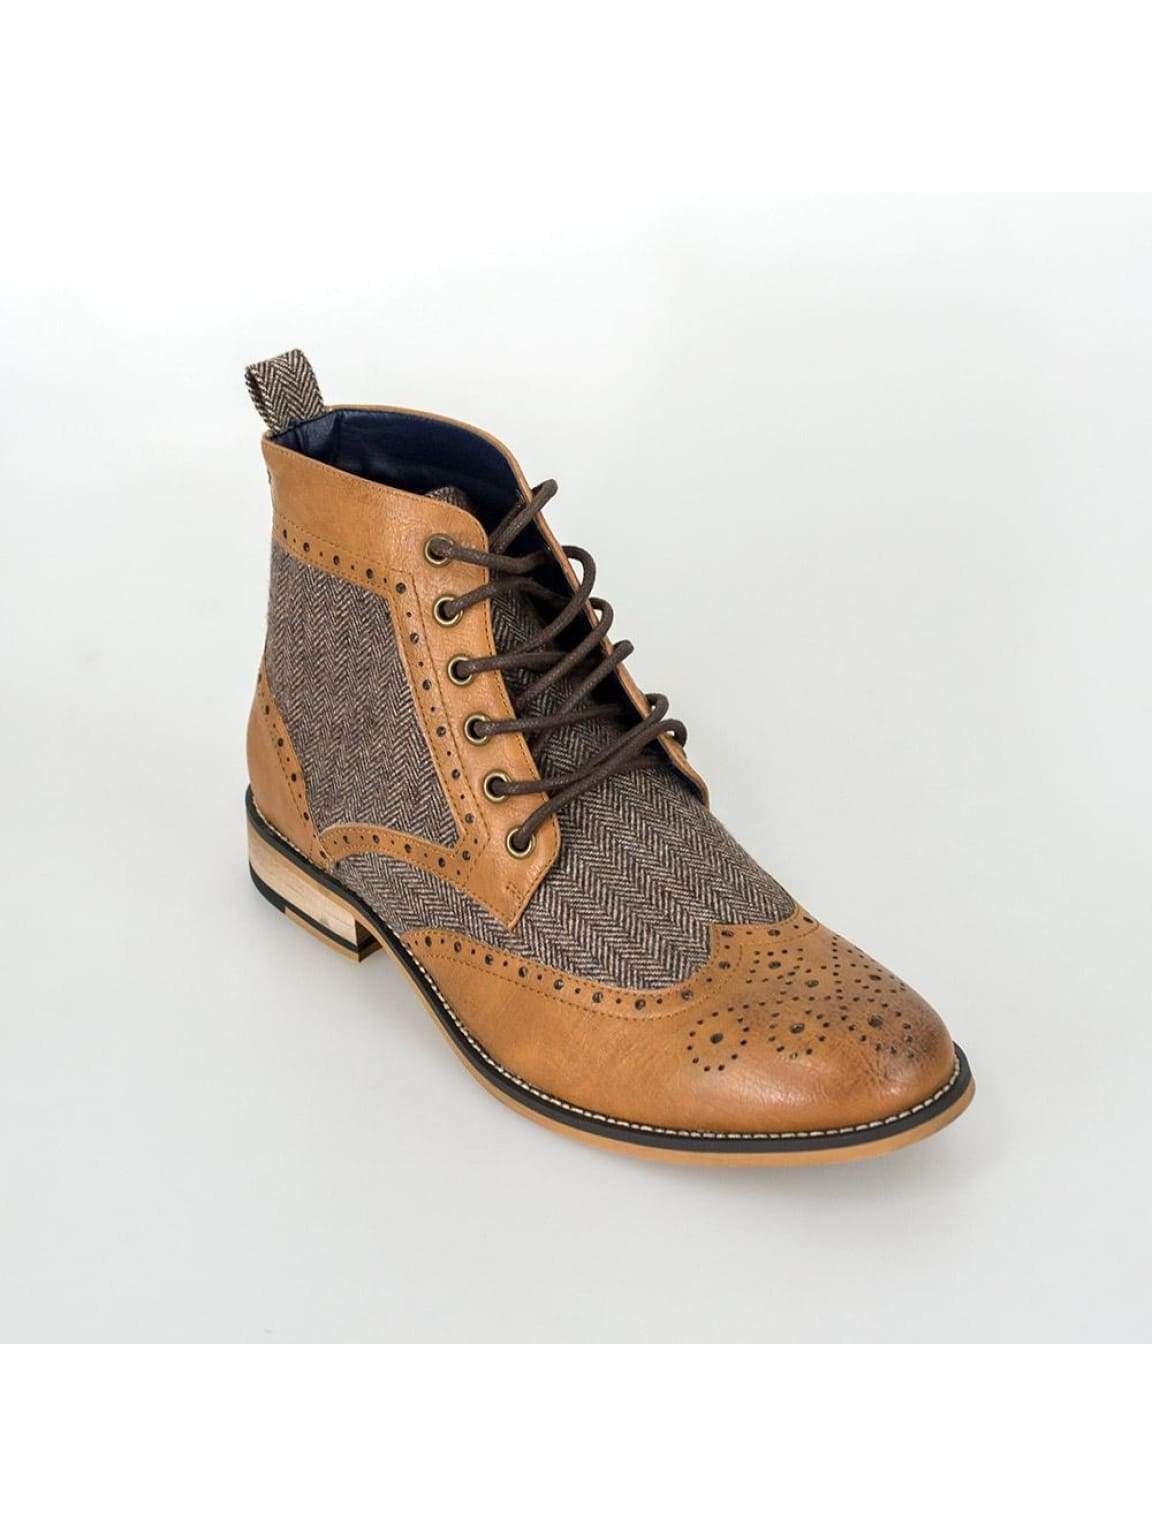 Cavani Sherlock Tan Mens Leather Boots - UK7   EU41 - Boots